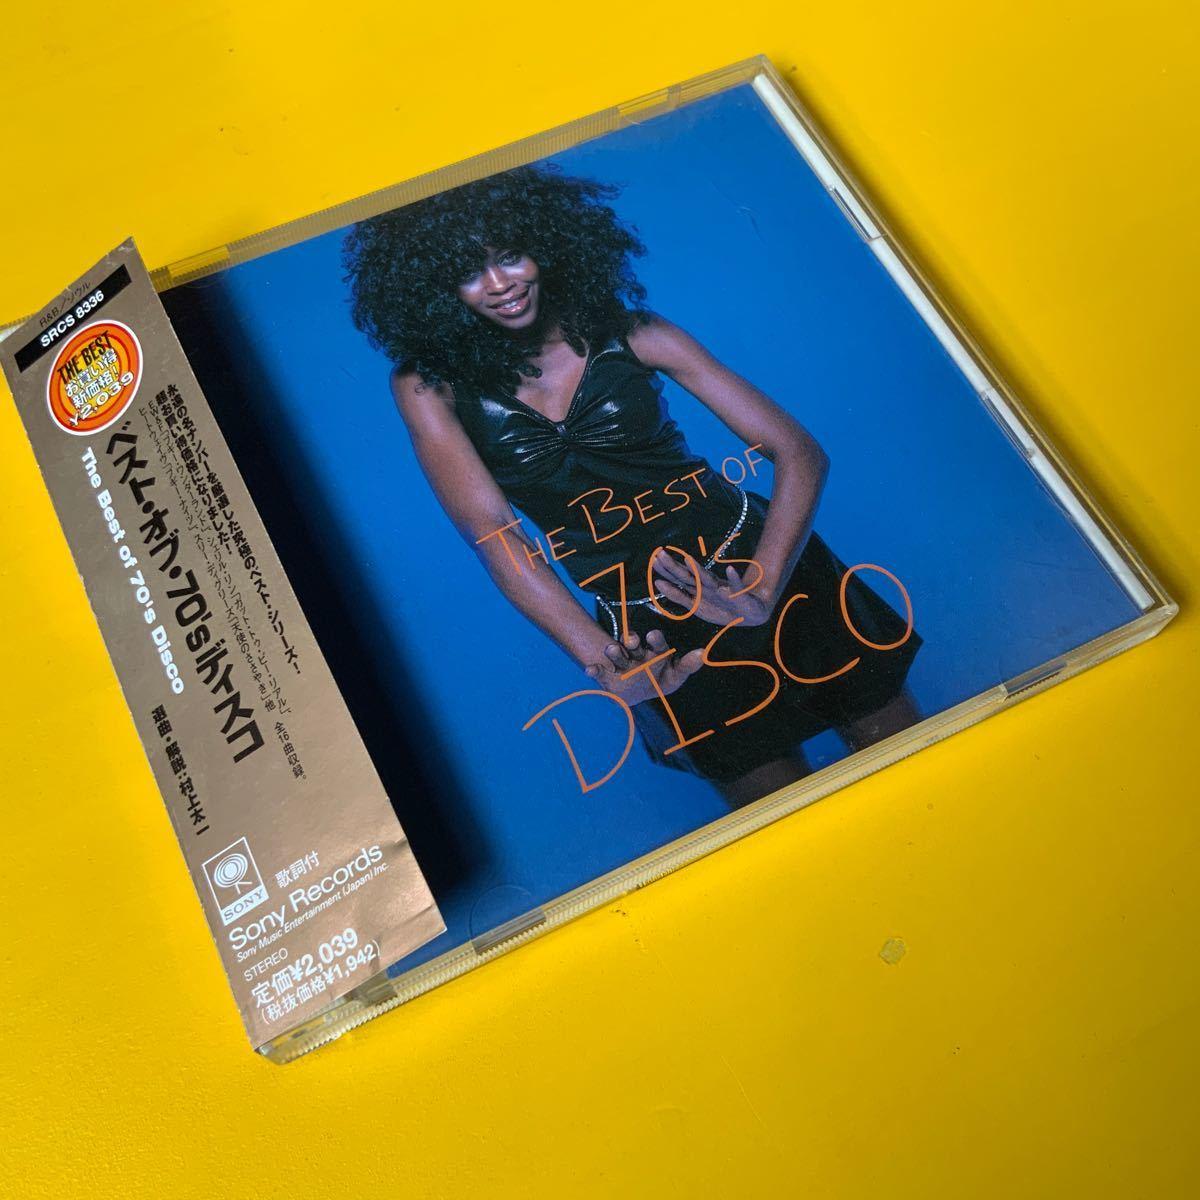 USED CD★国内盤★ベスト・オブ・70's ディスコ◆オムニバス ◆Best Of 70's Disco